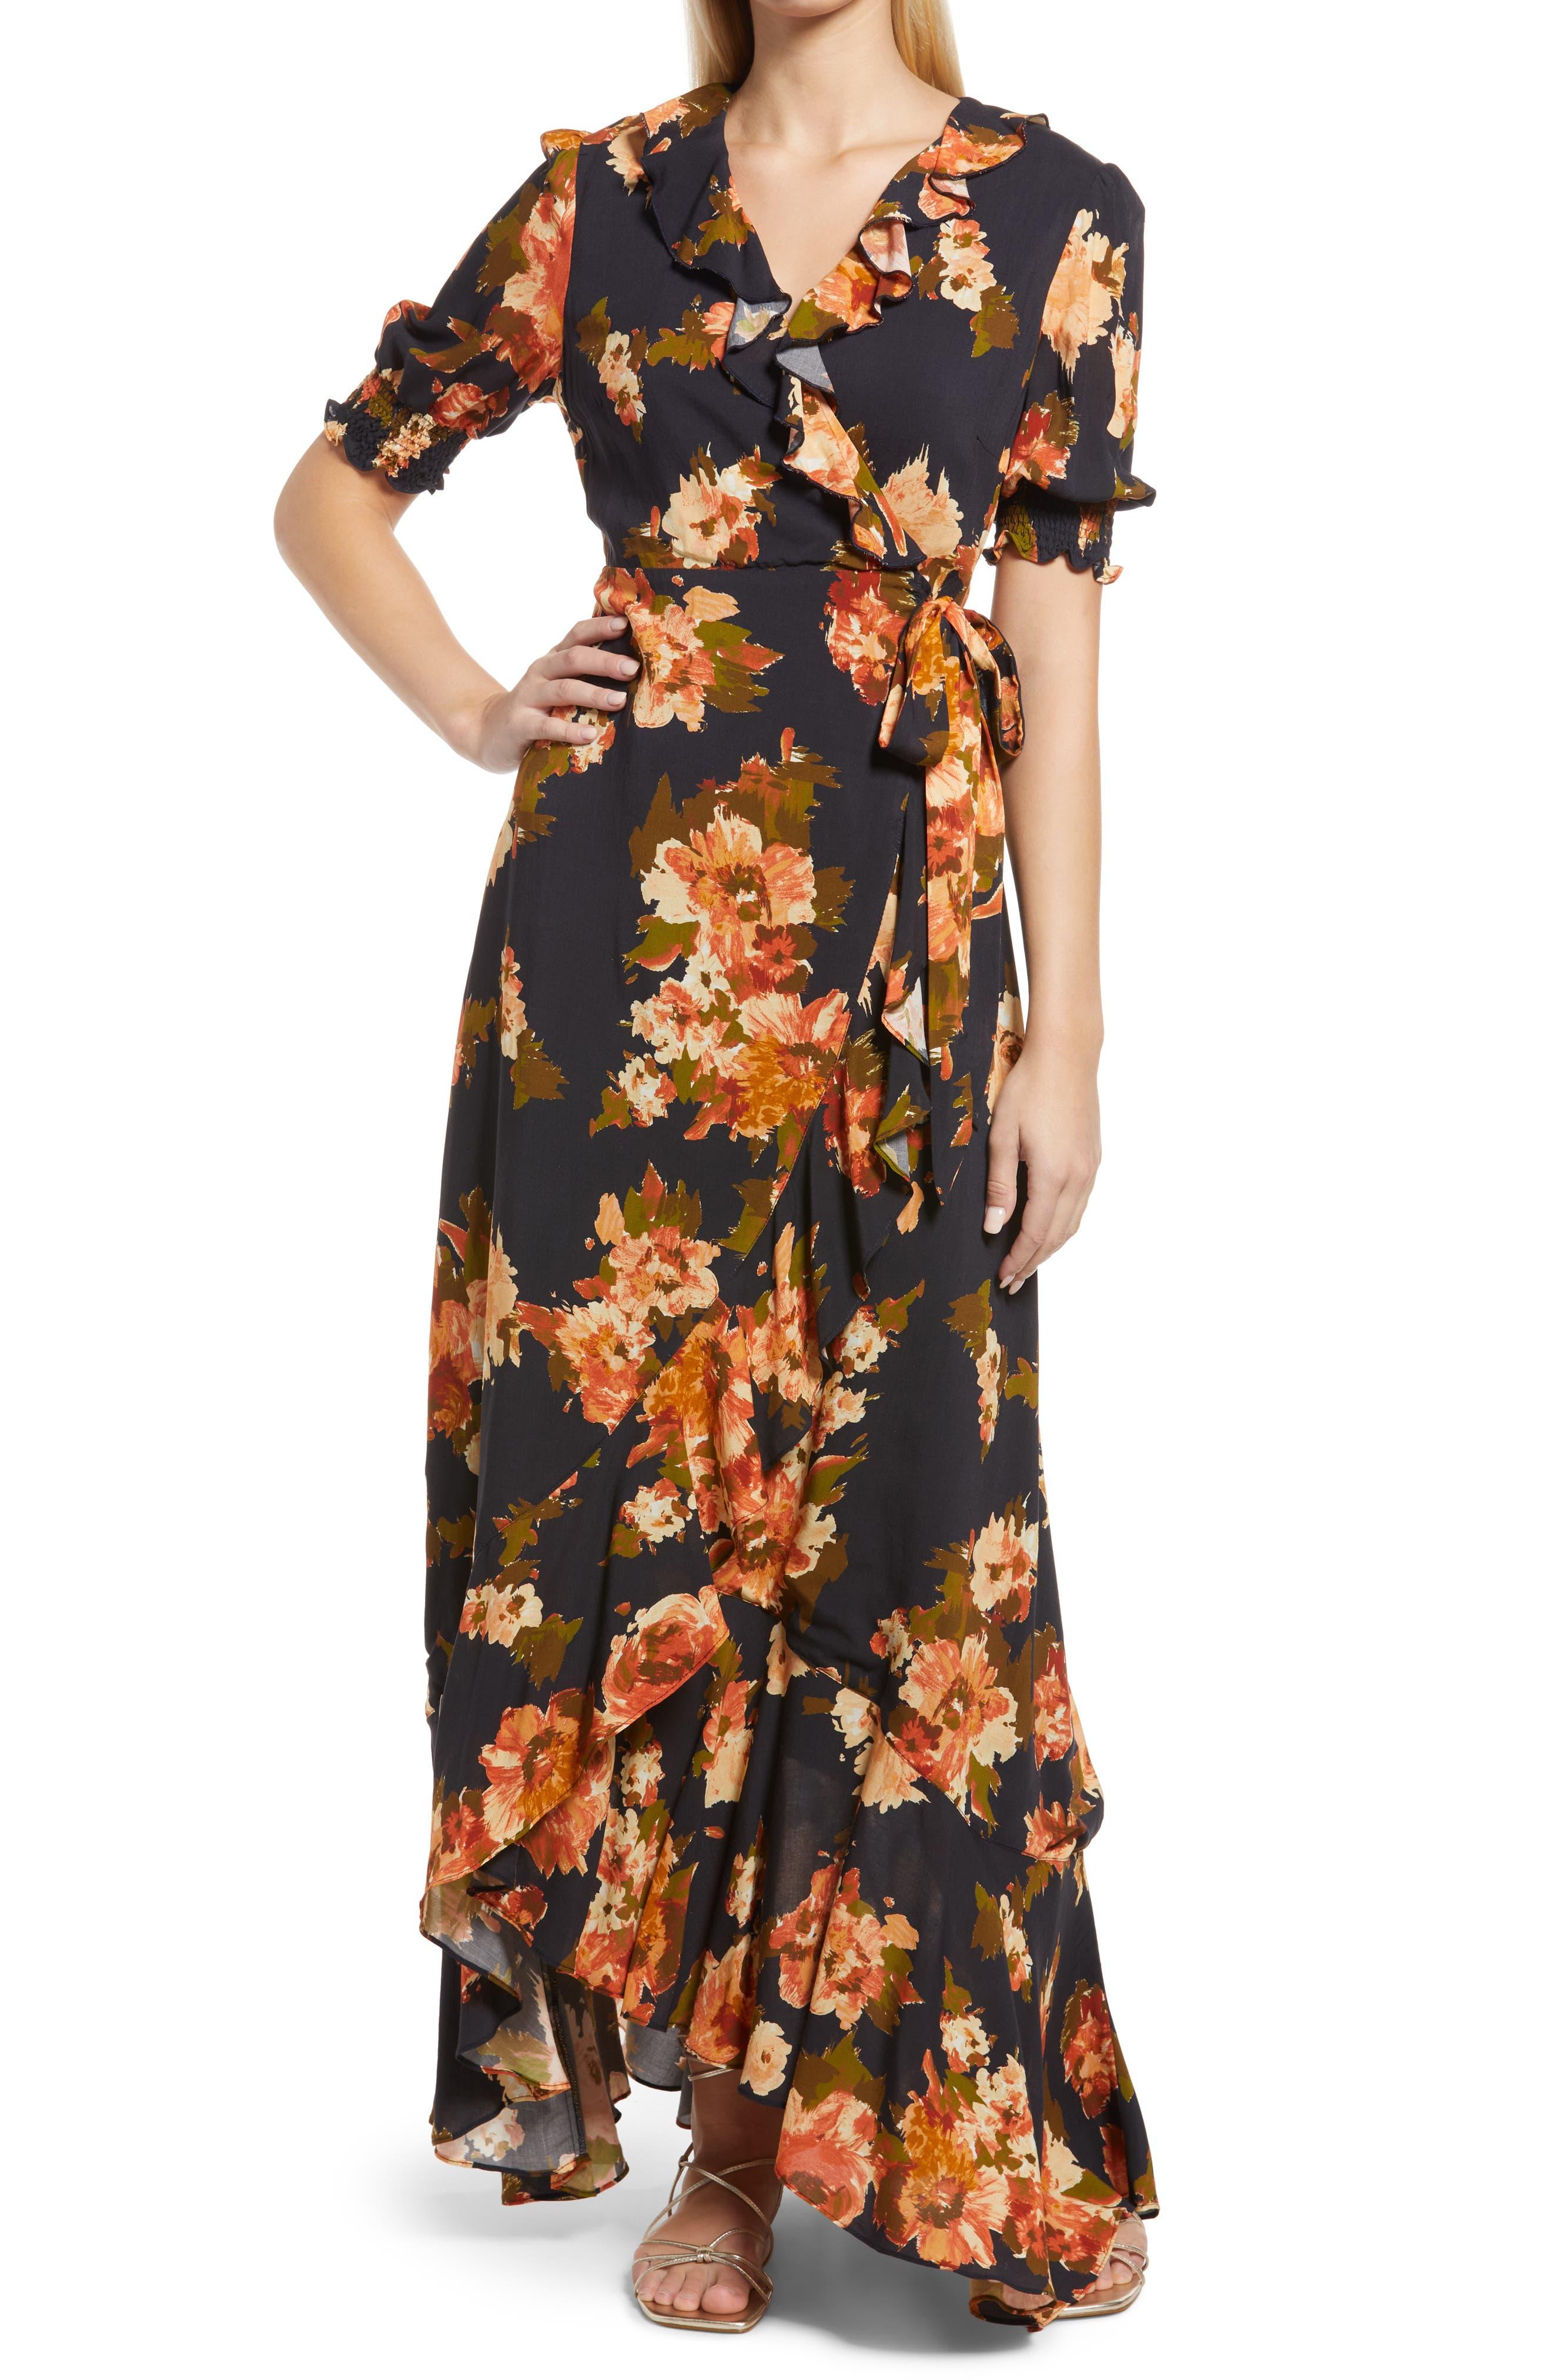 Floral Ruffled Wrap Dress